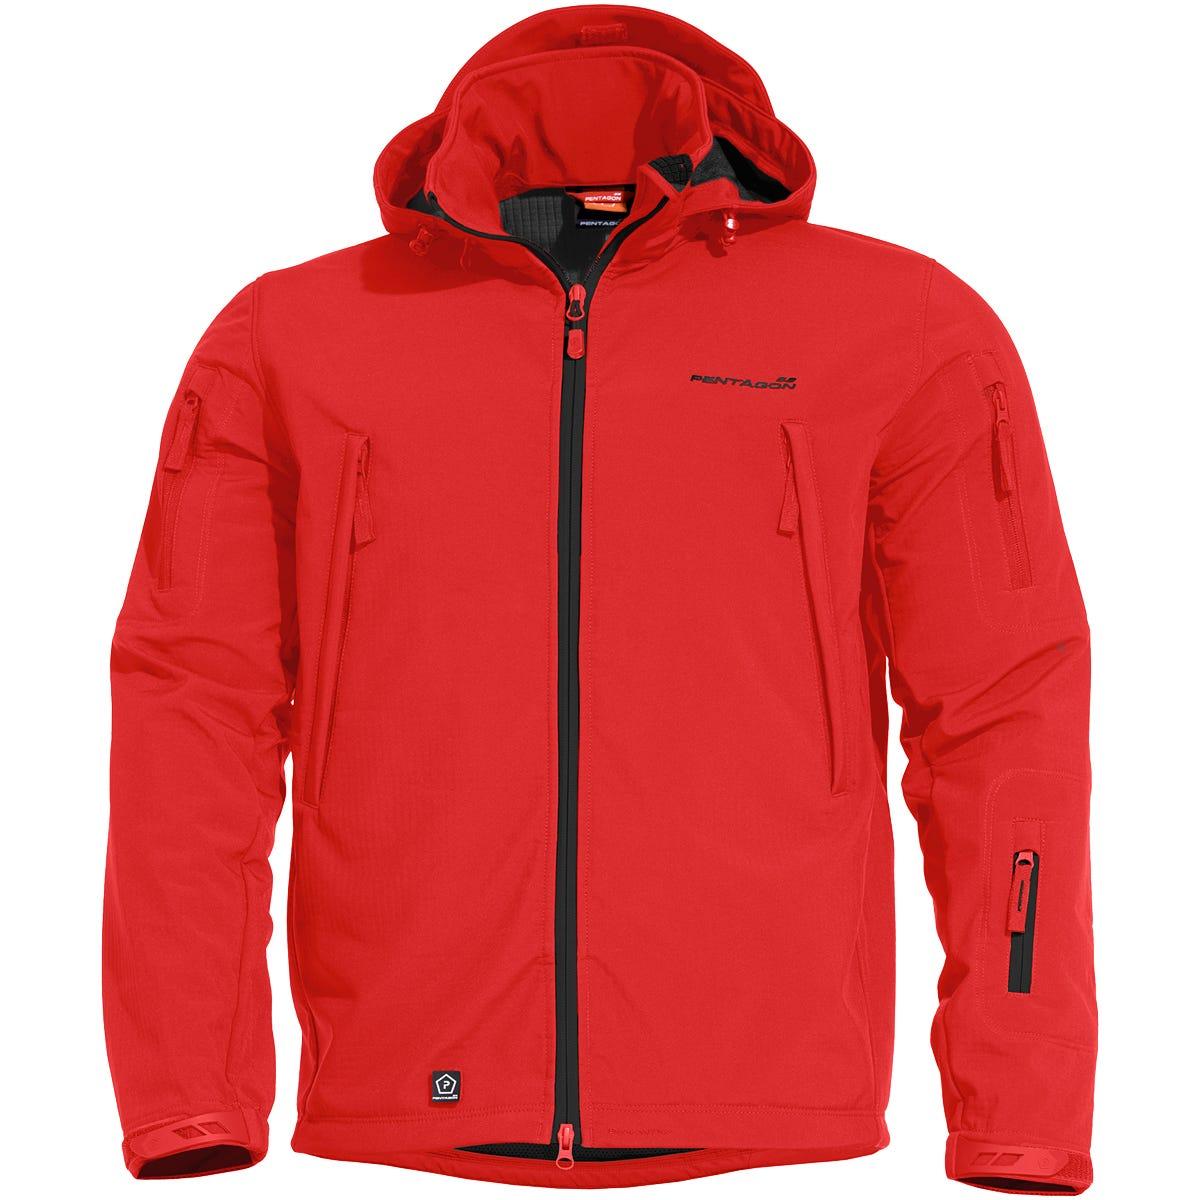 745b5cb00e7496 Pentagon Artaxes Escape Softshell Jacket Red